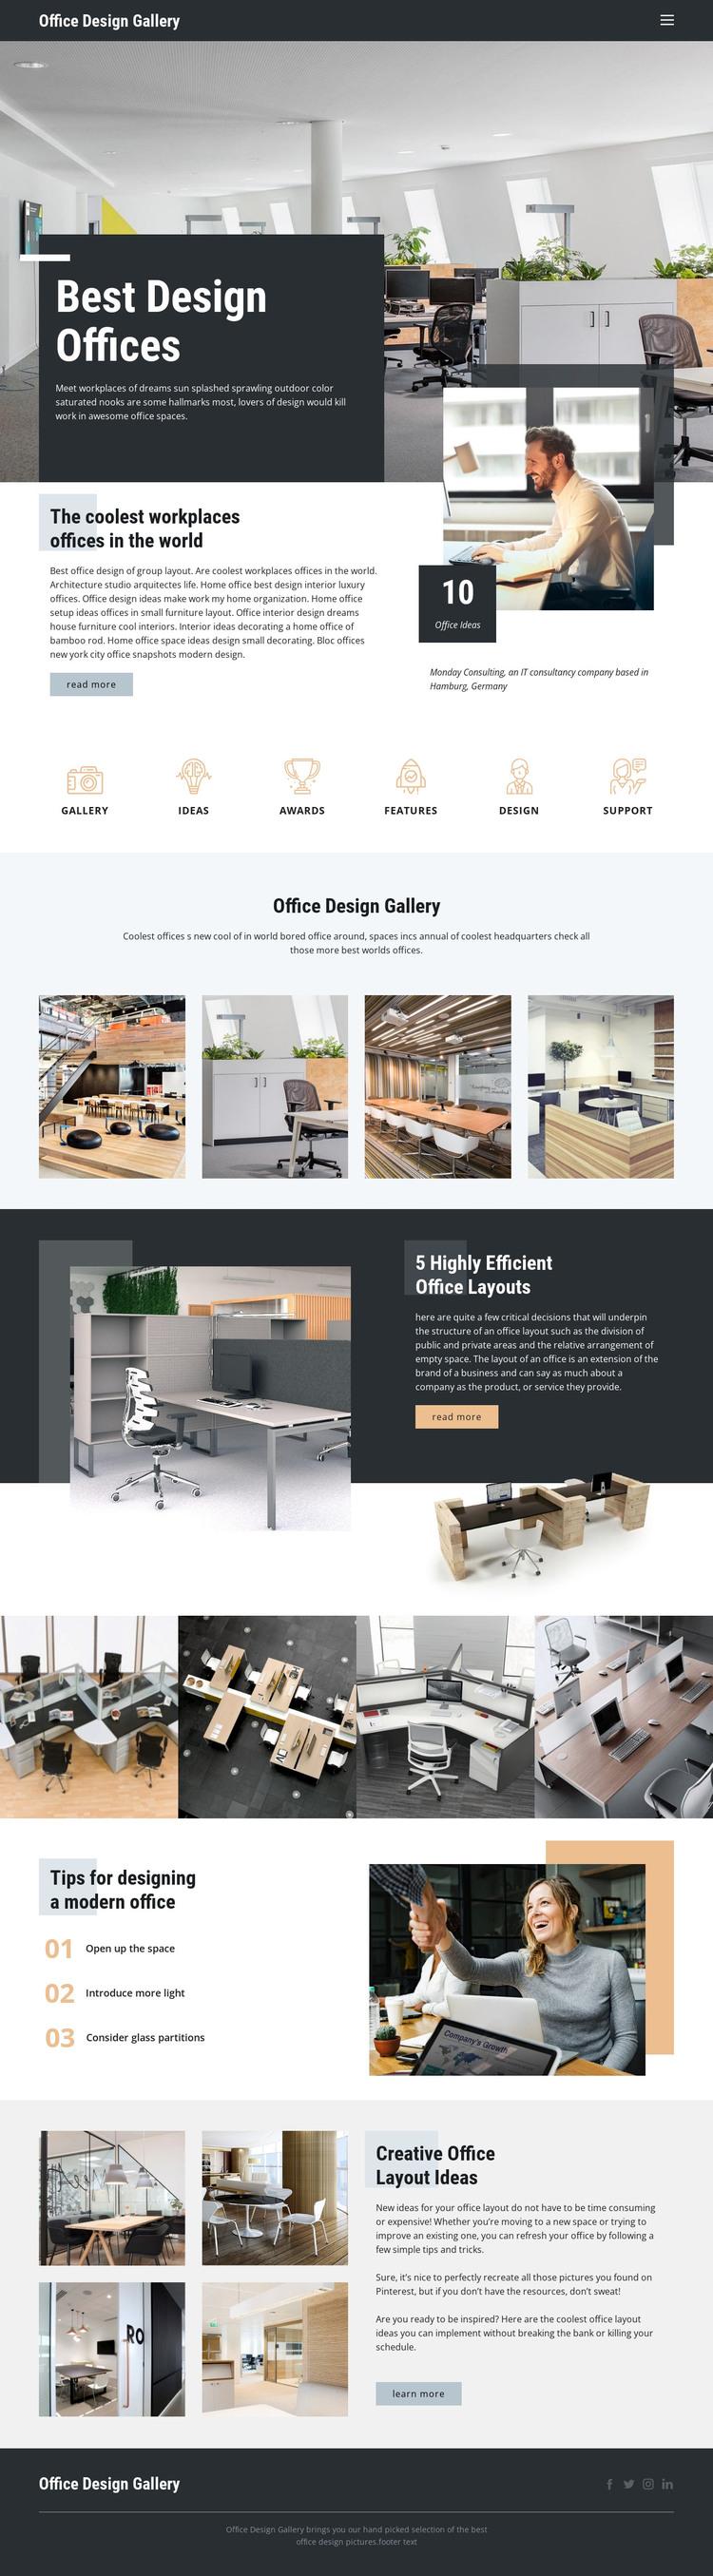 Best Design Offices Web Design